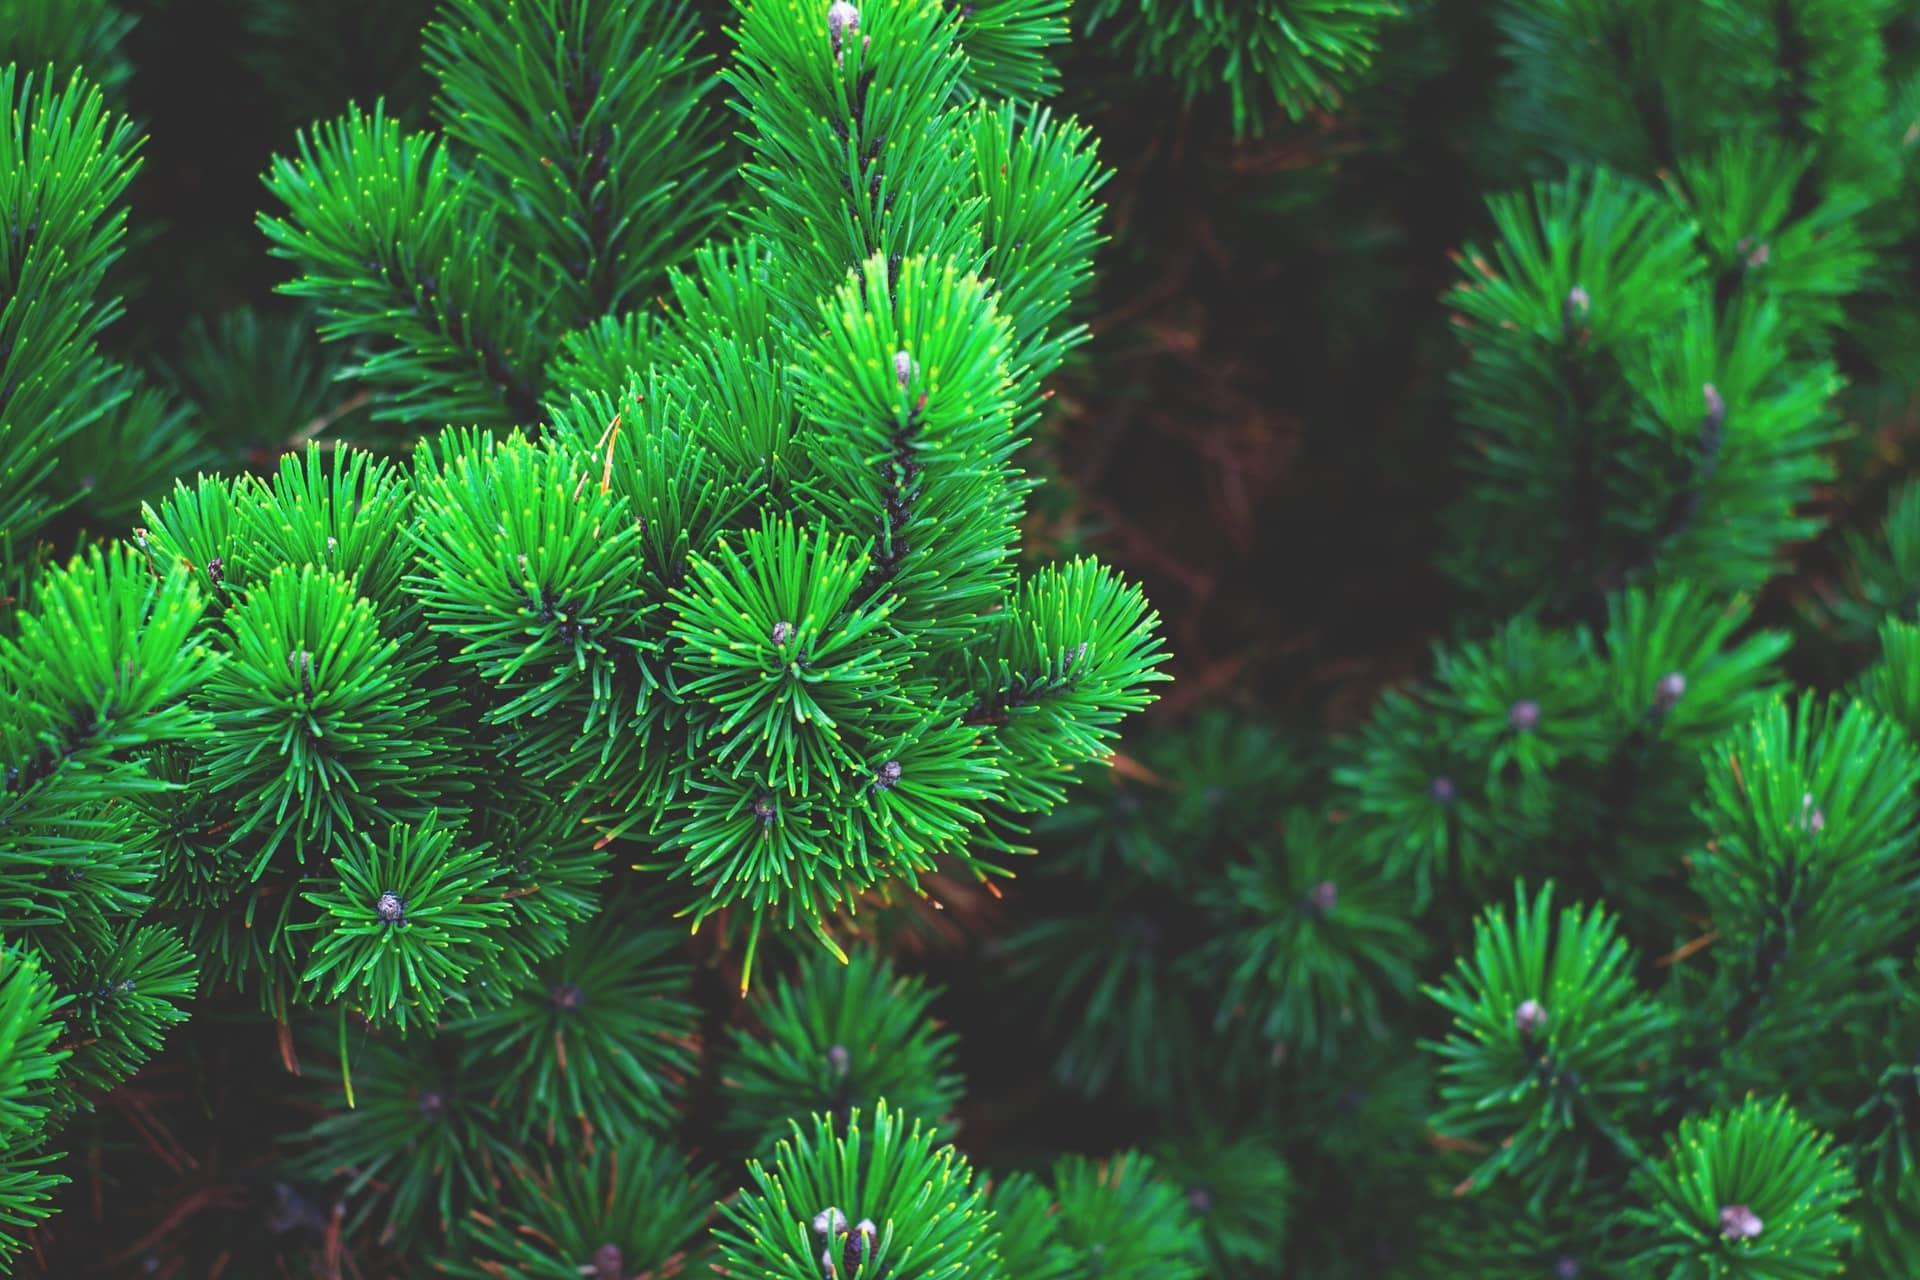 pine-tree-photo-243945